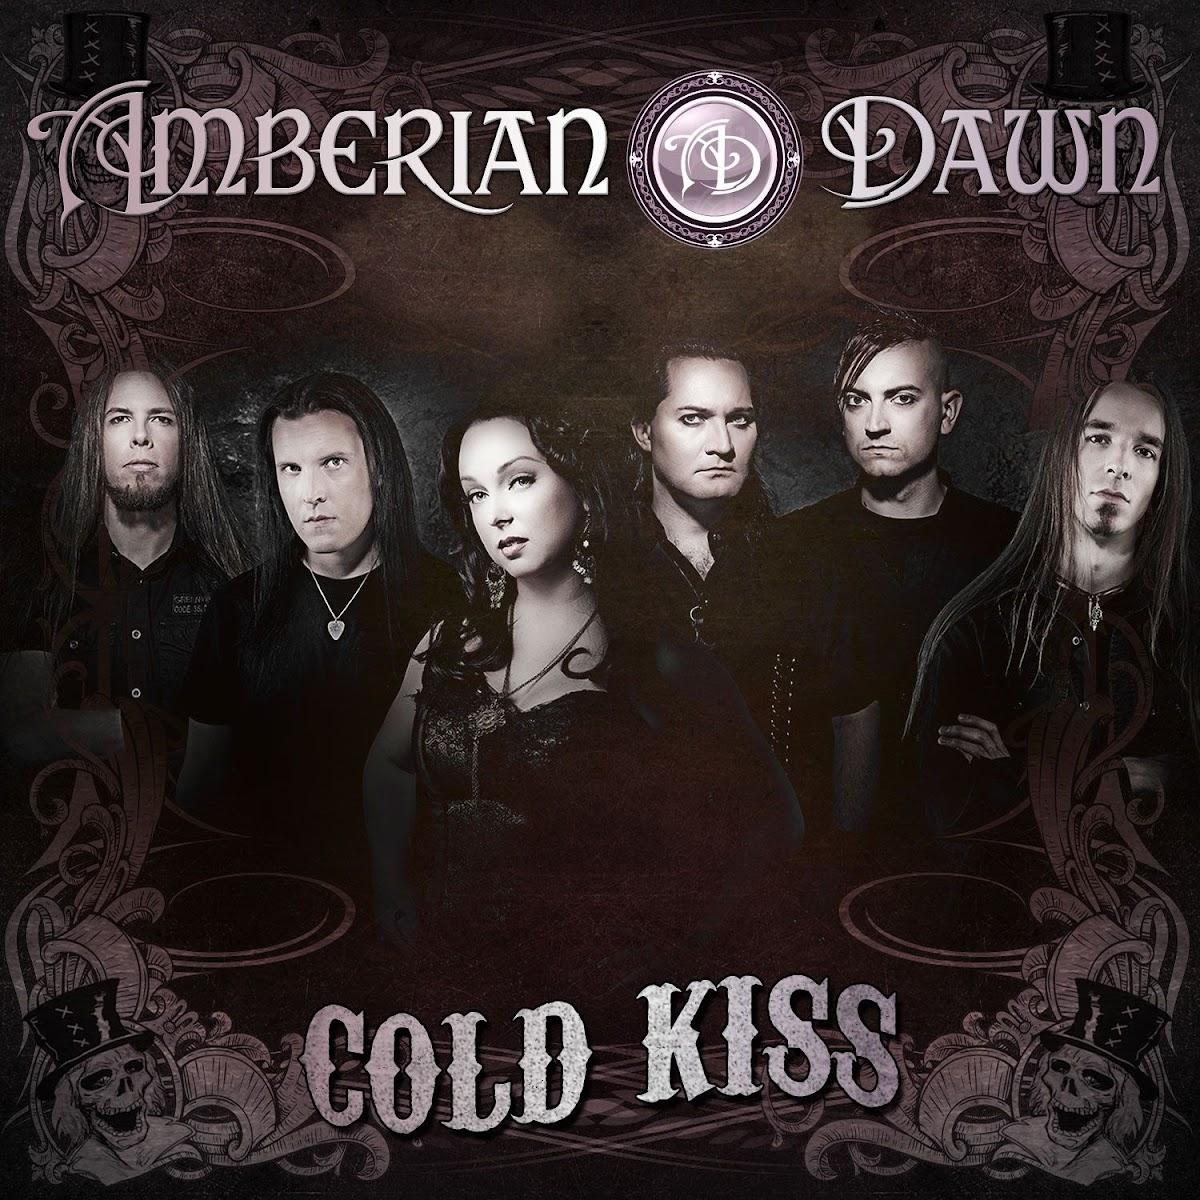 http://3.bp.blogspot.com/-oVw_TRJBCyo/TzDvMep458I/AAAAAAAAFiQ/Wds56yEyZkI/s1200/Cold+Kiss+(Single).jpg